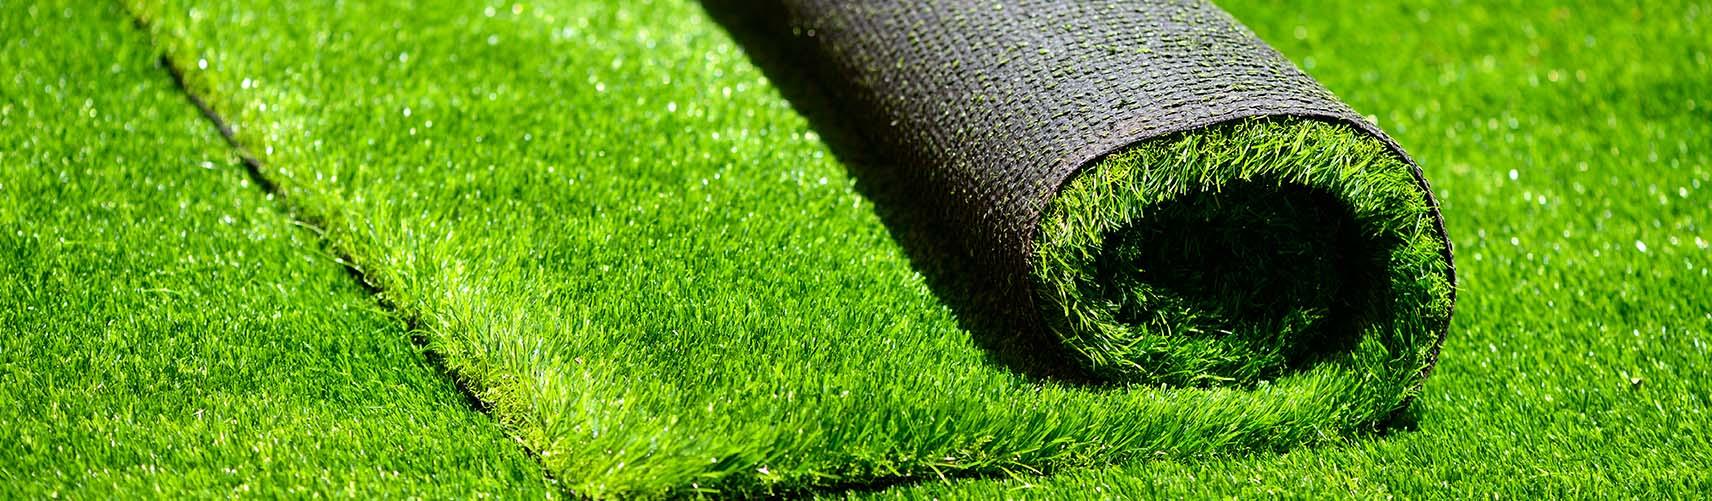 Littlerock Artificial Grass Installation, Paving and Outdoor Kitchen Construction